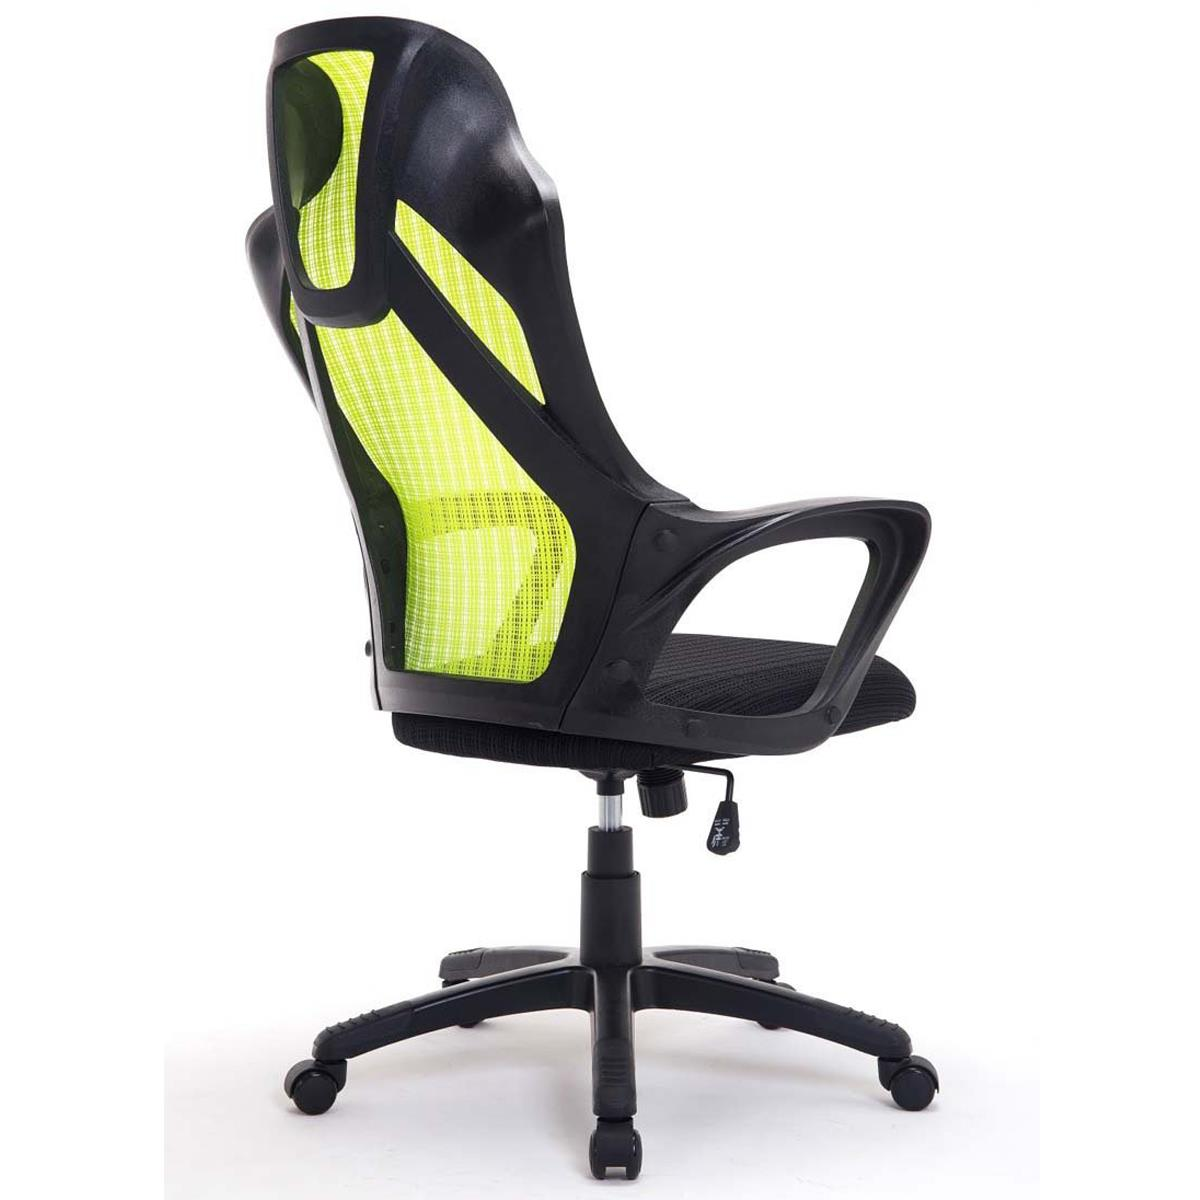 Sedia Gaming per computer YUCATAN, design sportivo, in ...